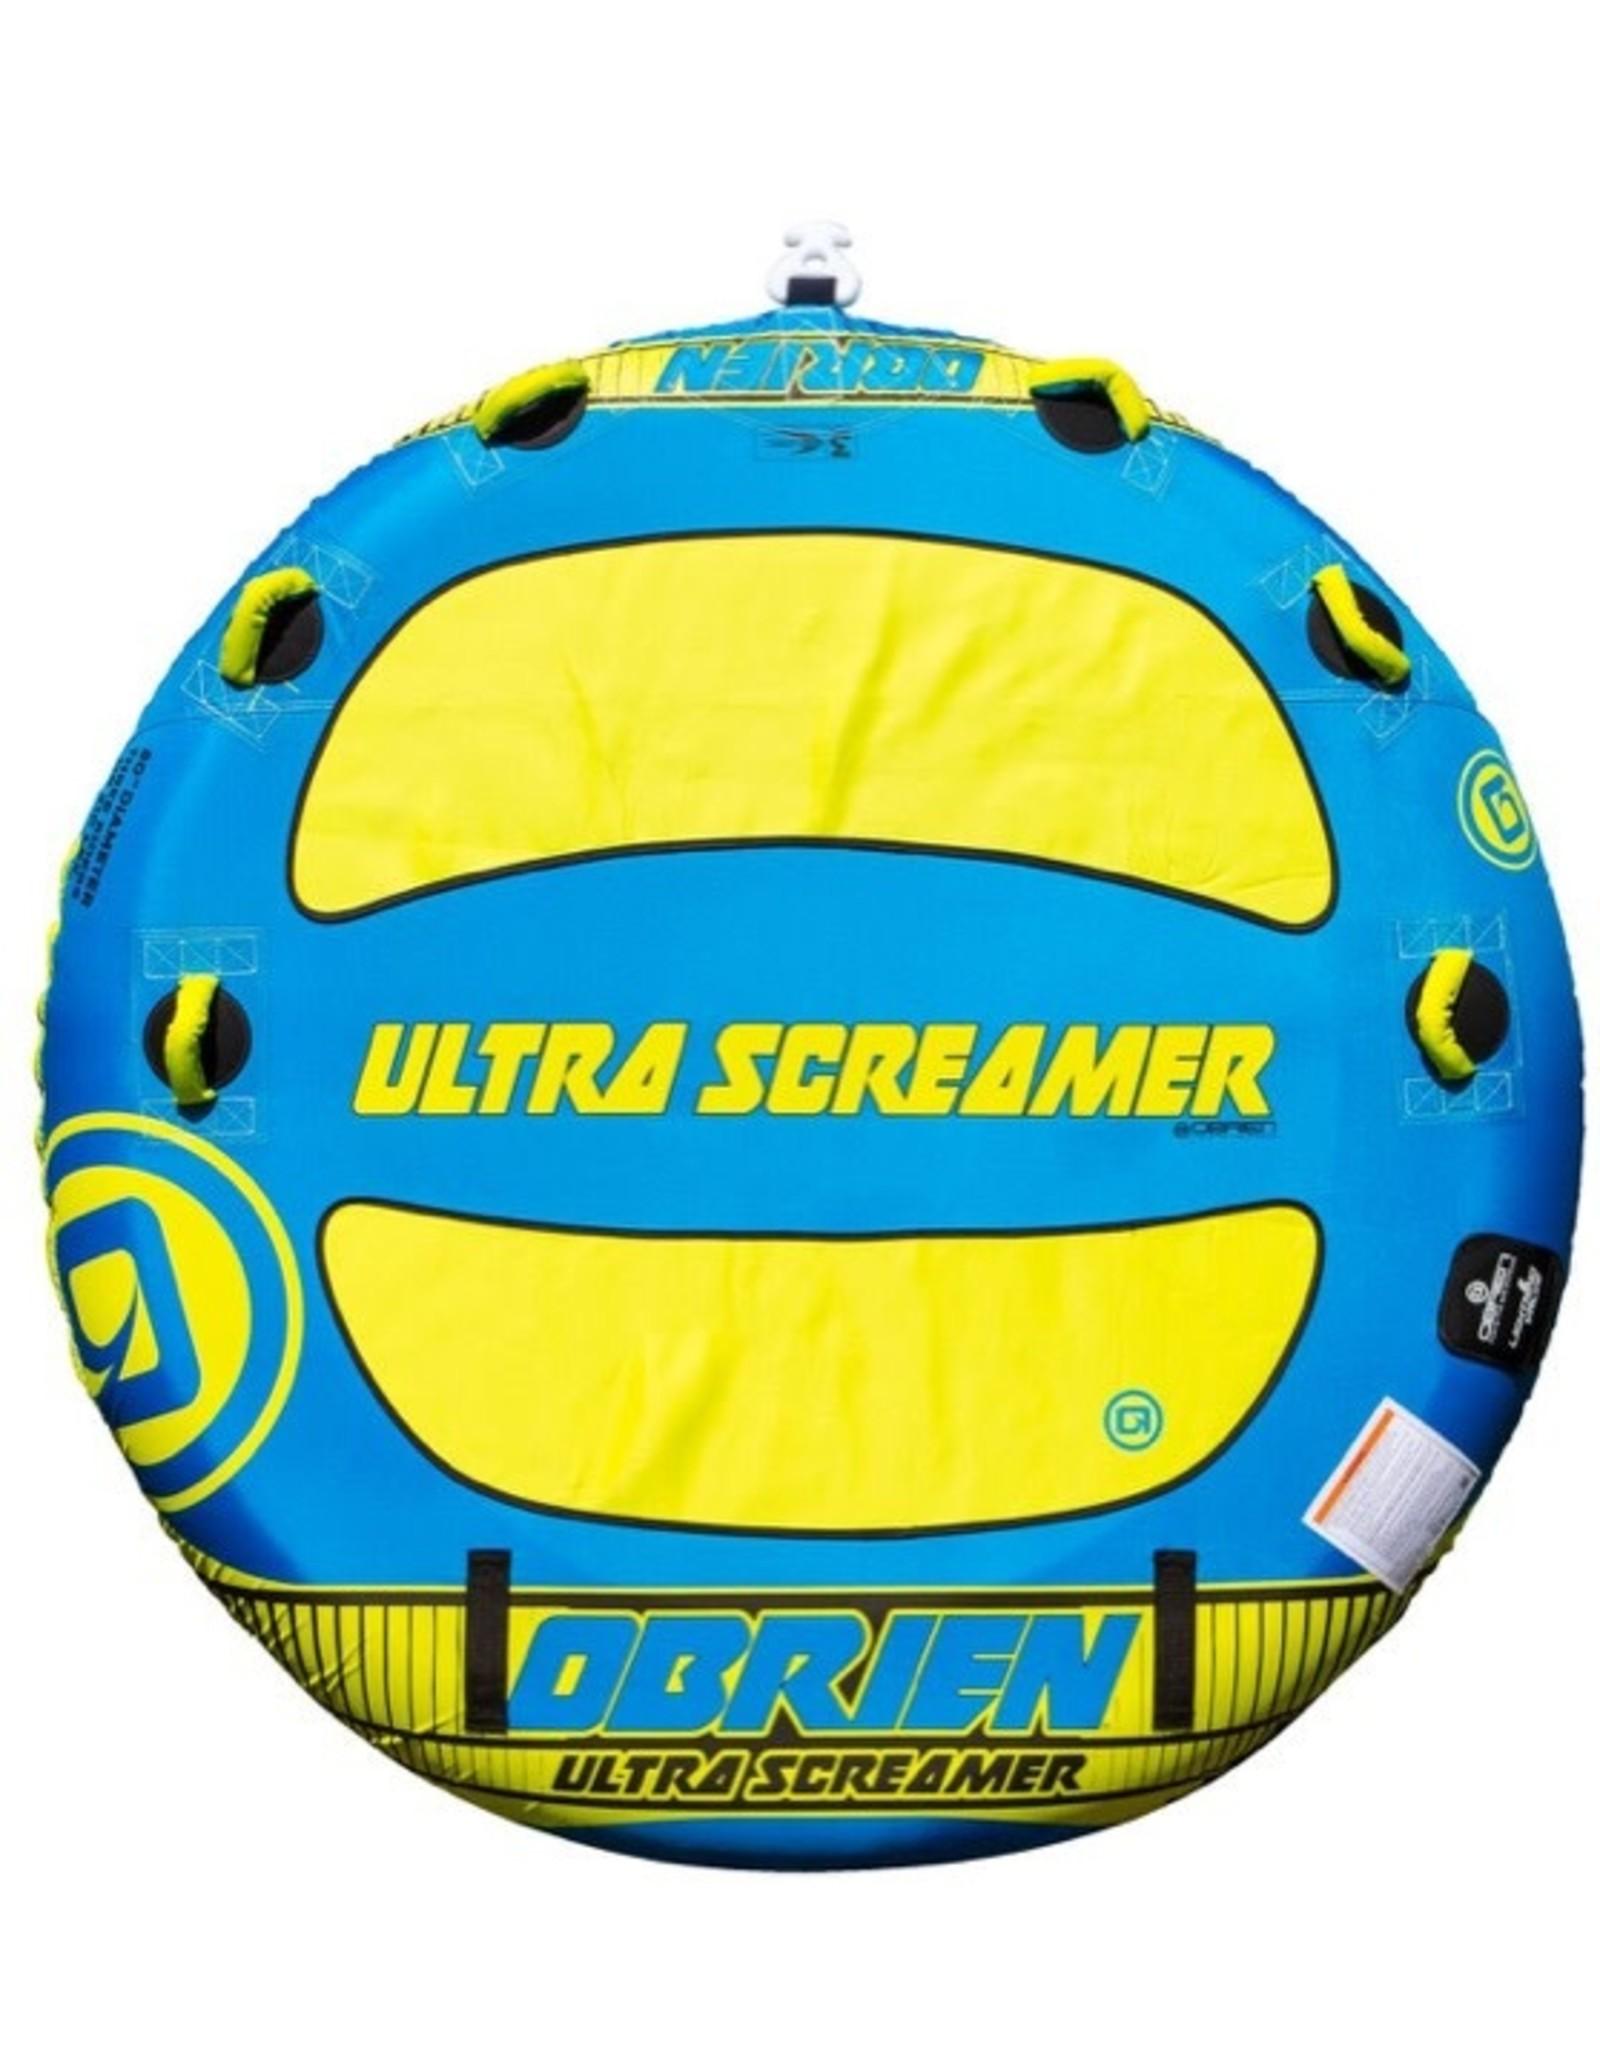 O'Brien Ultra Screamer 80 - Yellow